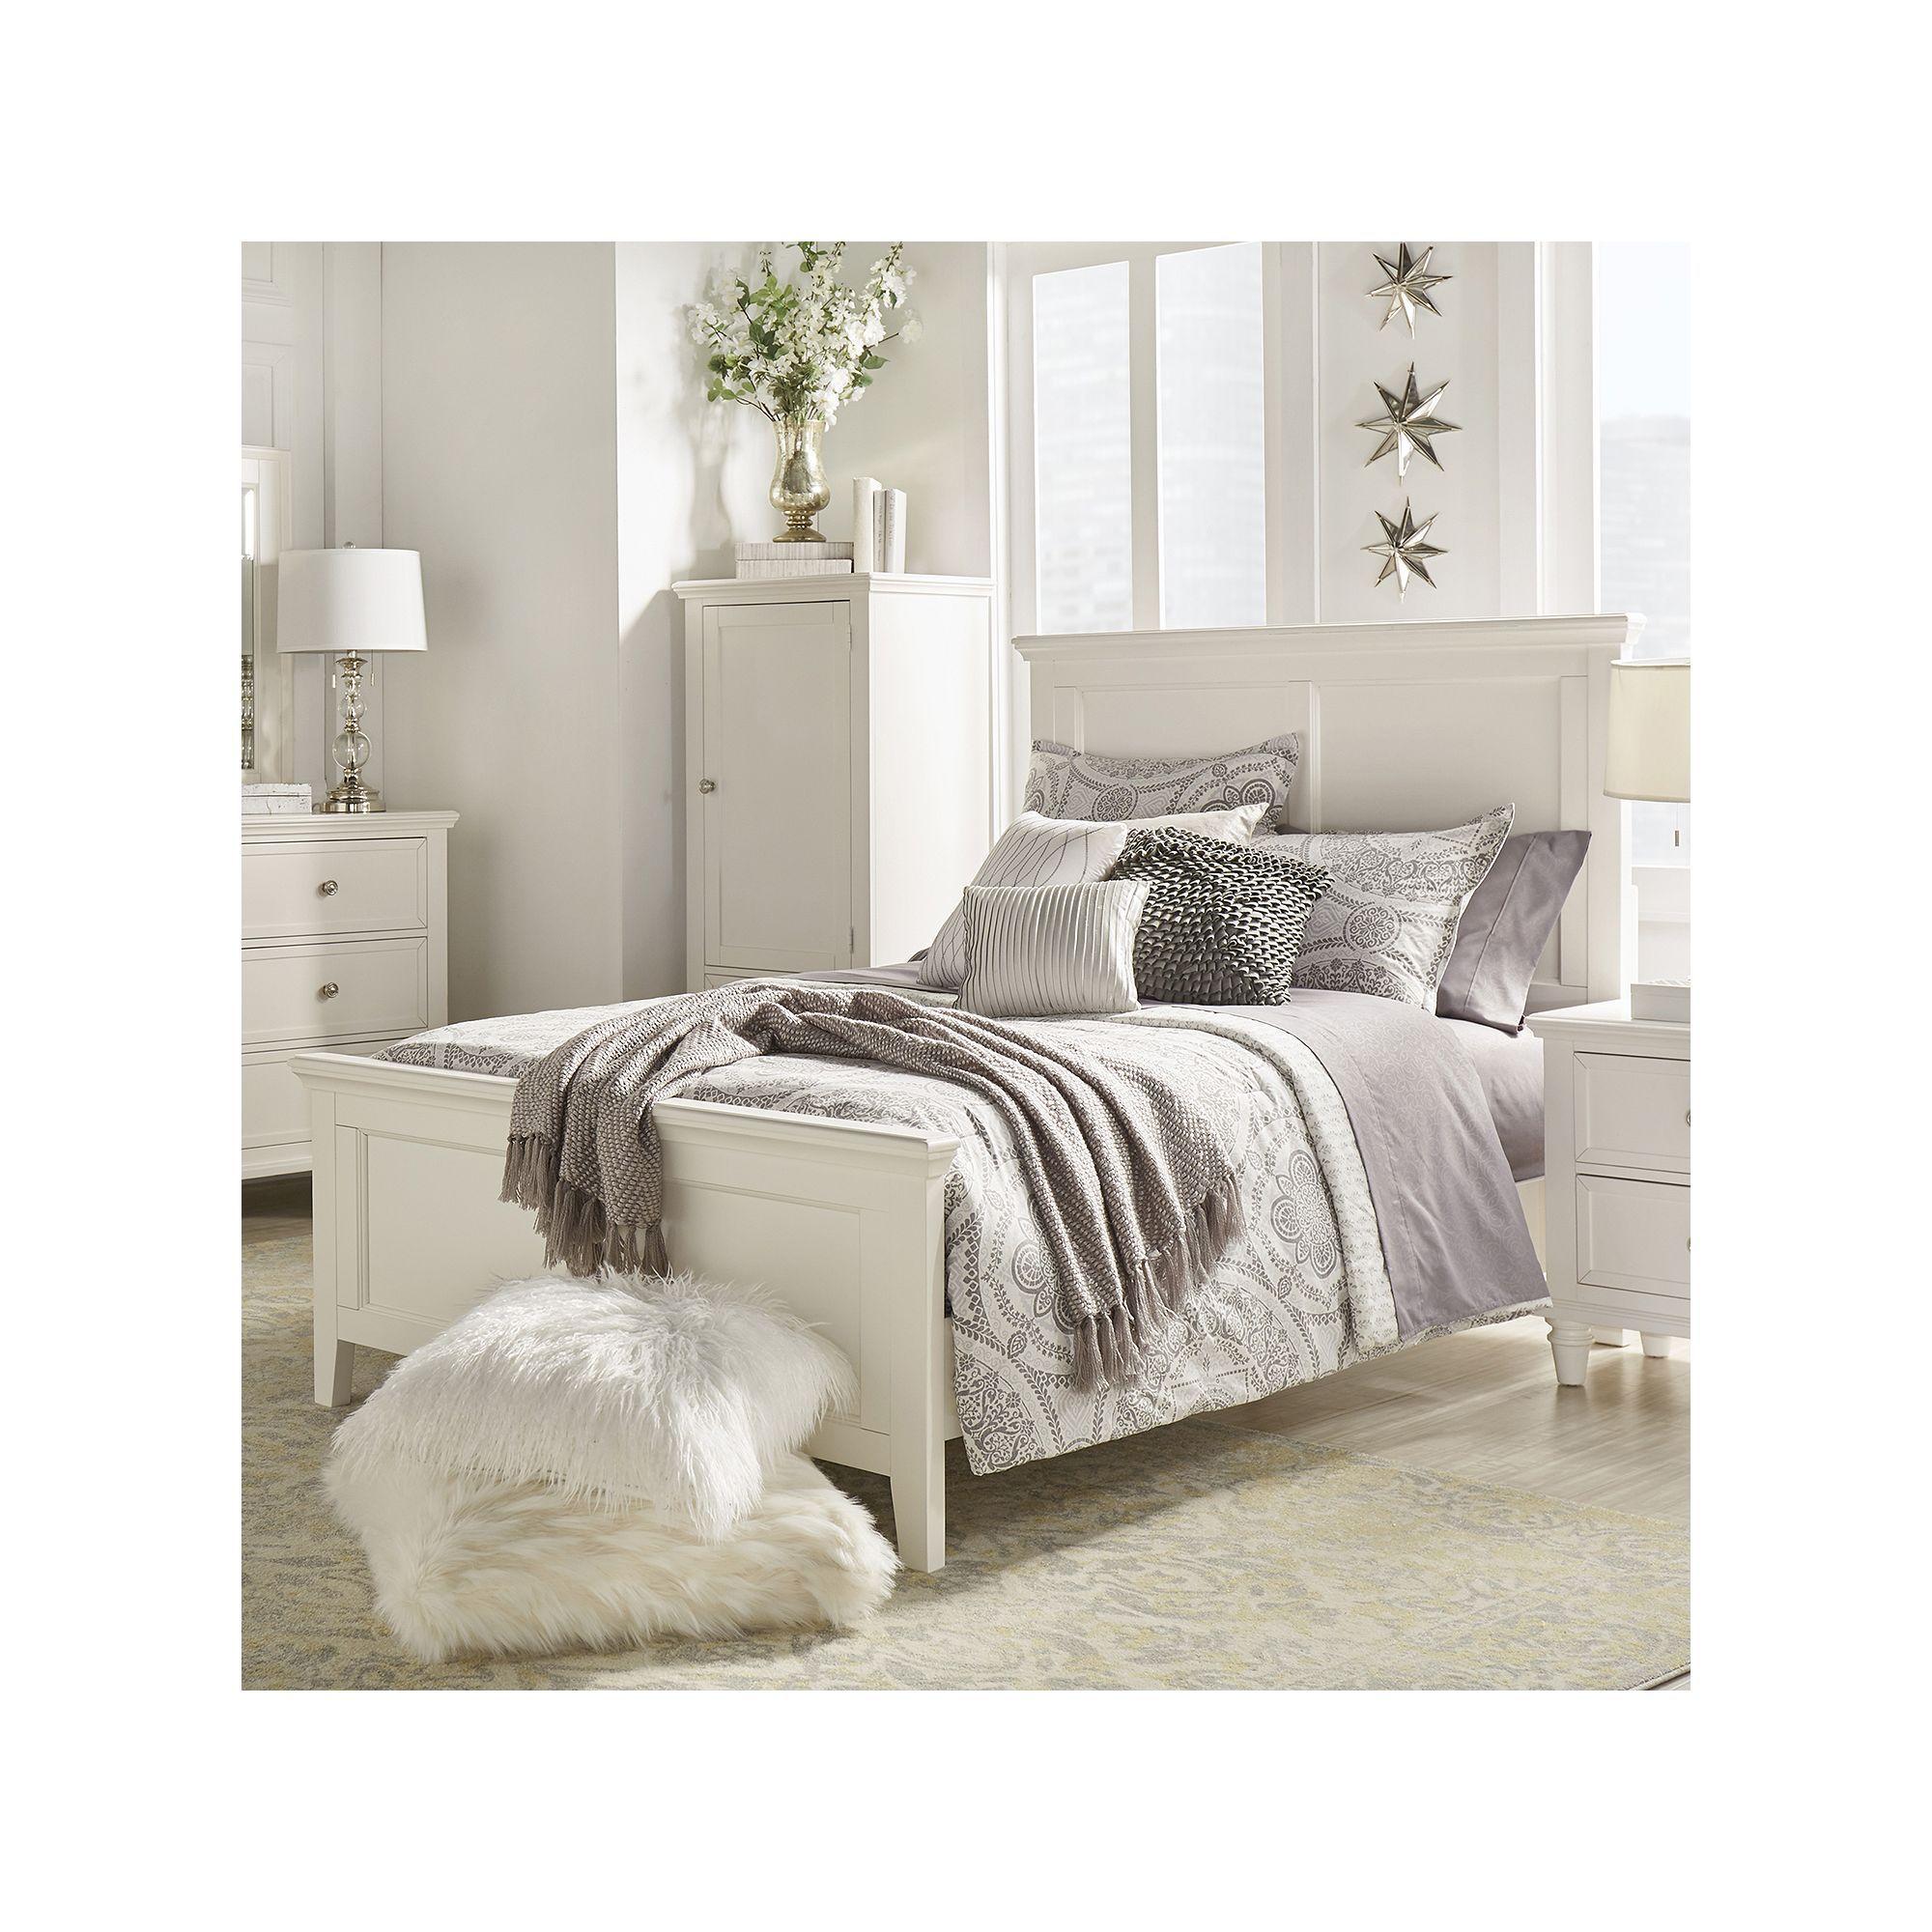 HomeVance Augustine Paneled Bed, White White bedroom